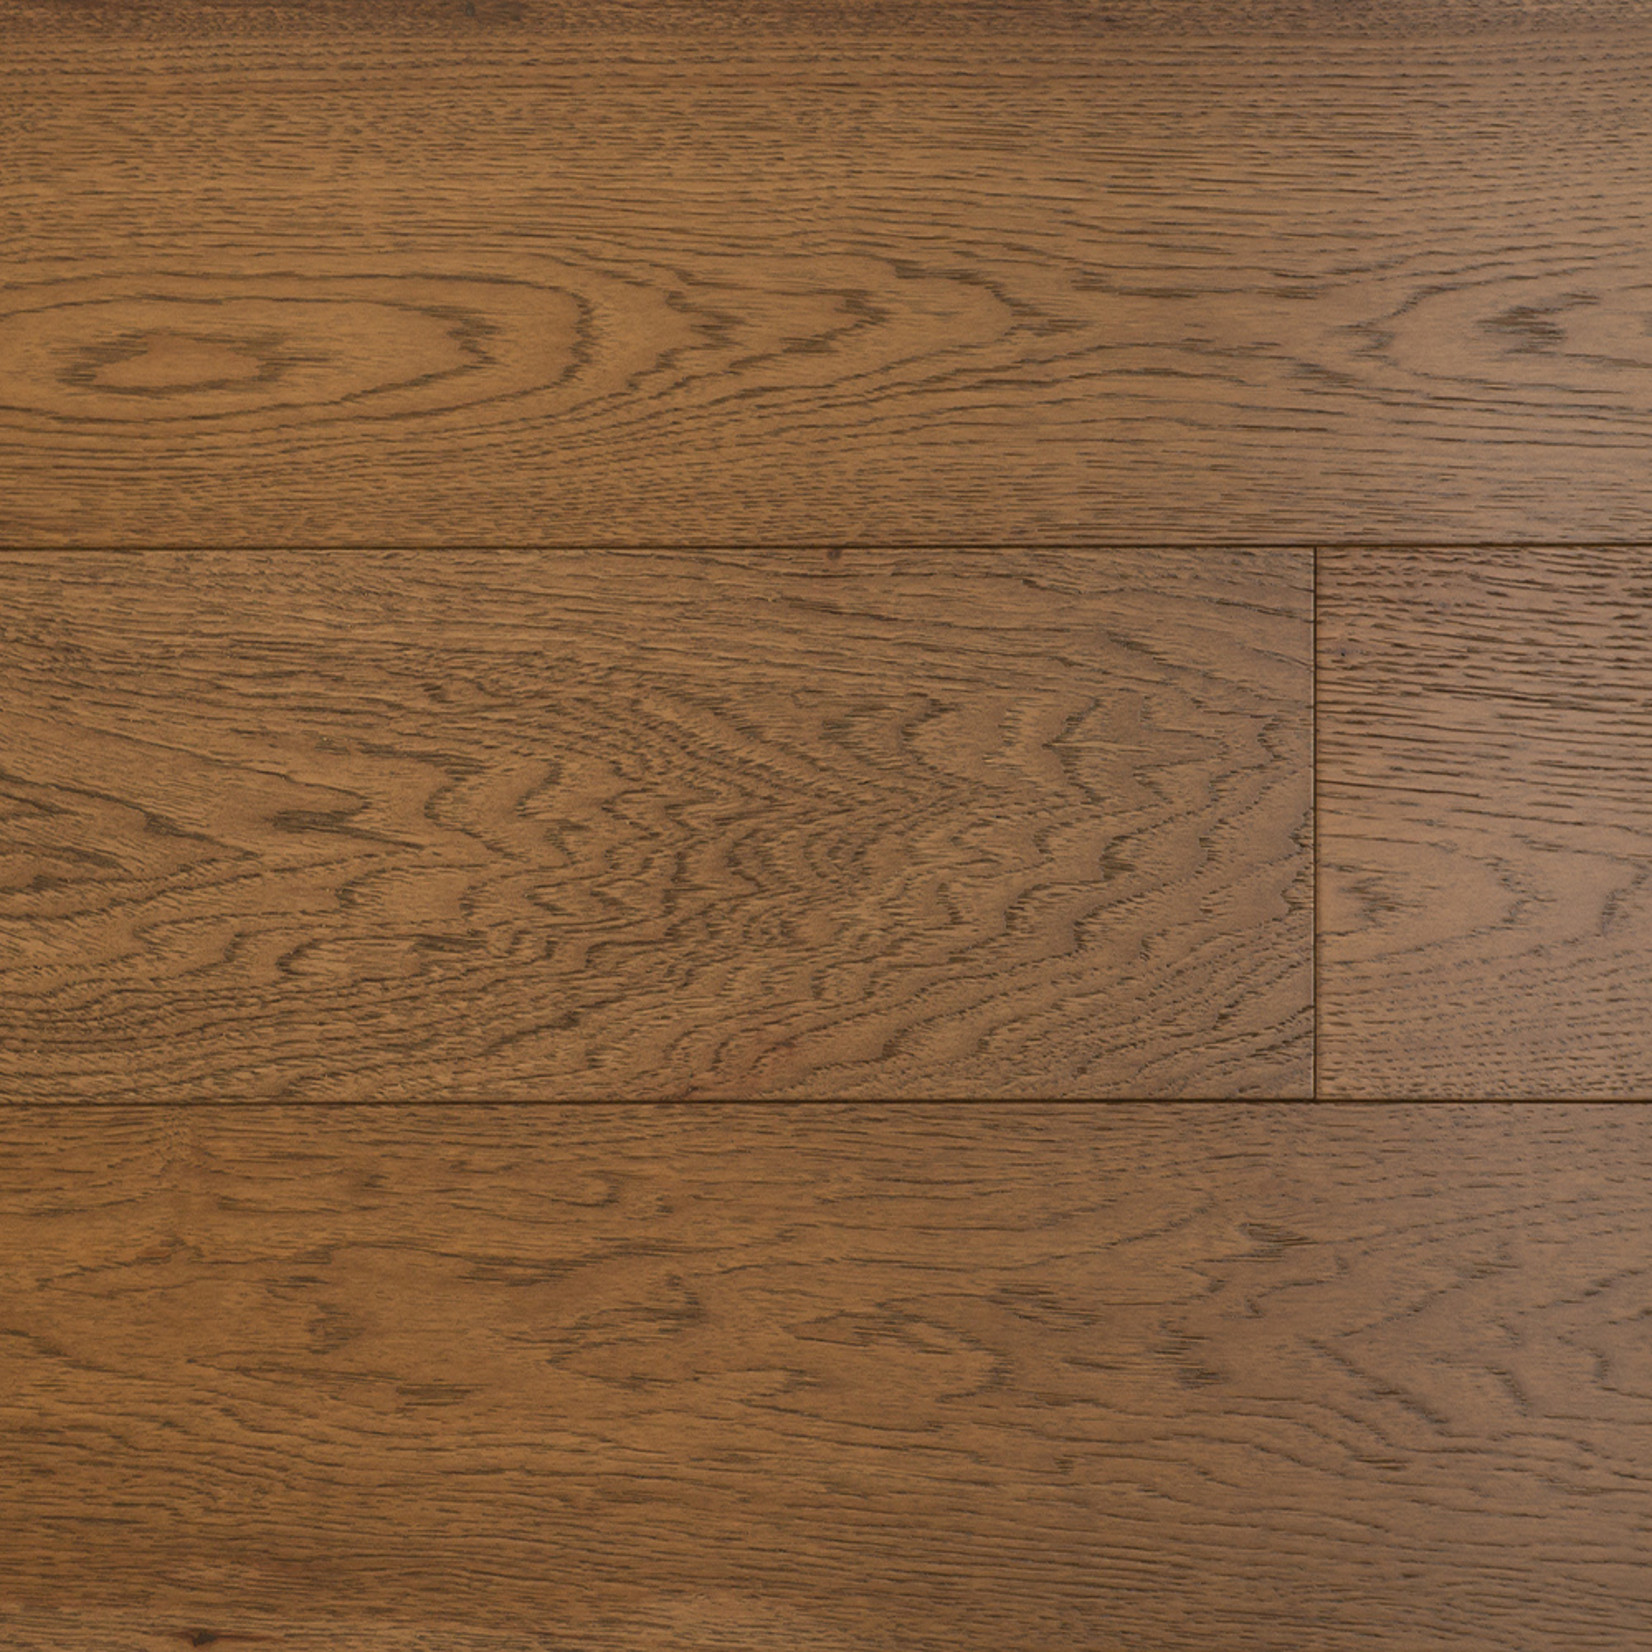 "Vidar Design Flooring Vidar - Ingénierie 3/4"" Hickory verni mat"